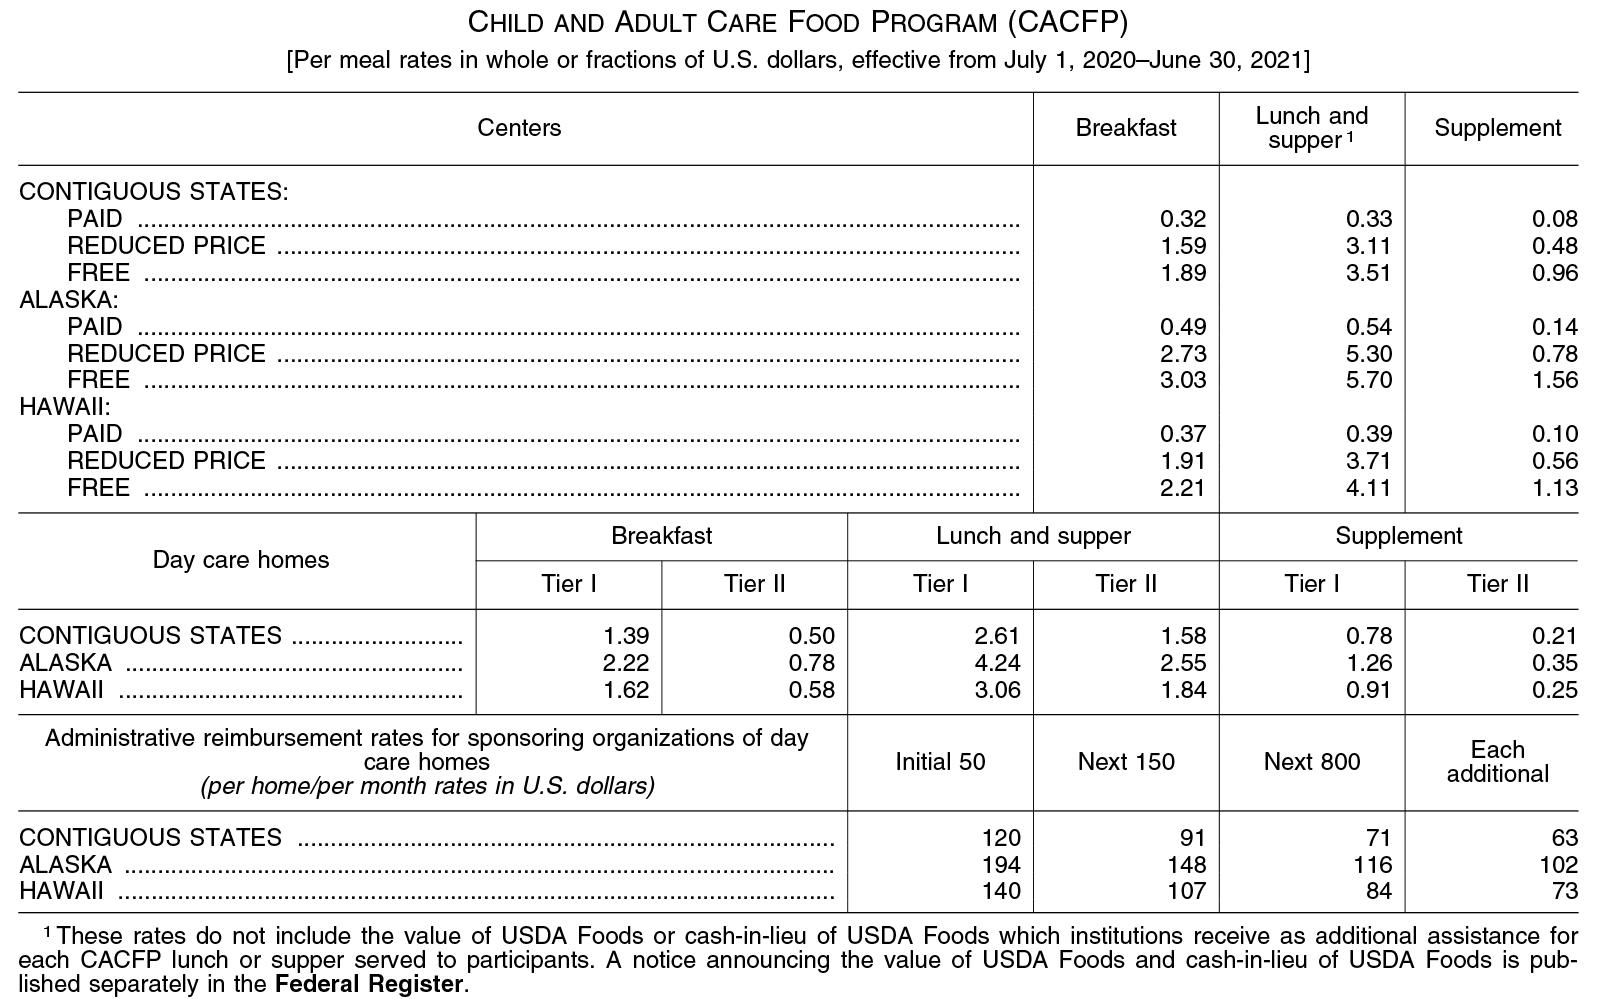 2020-21 Rates of Reimbursement